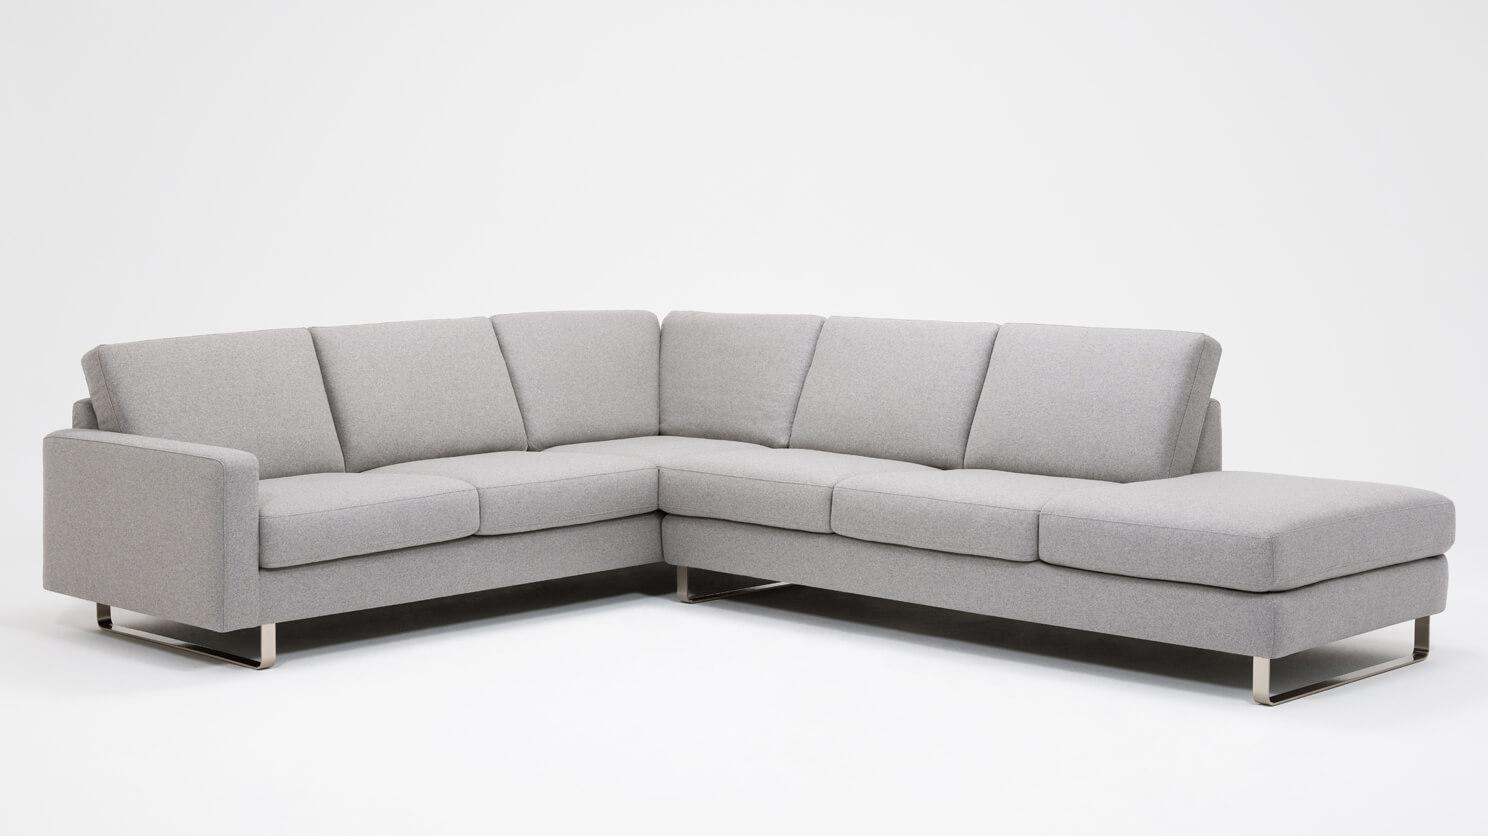 Oskar 2 Piece Sectional Sofa With Headrests Fabric